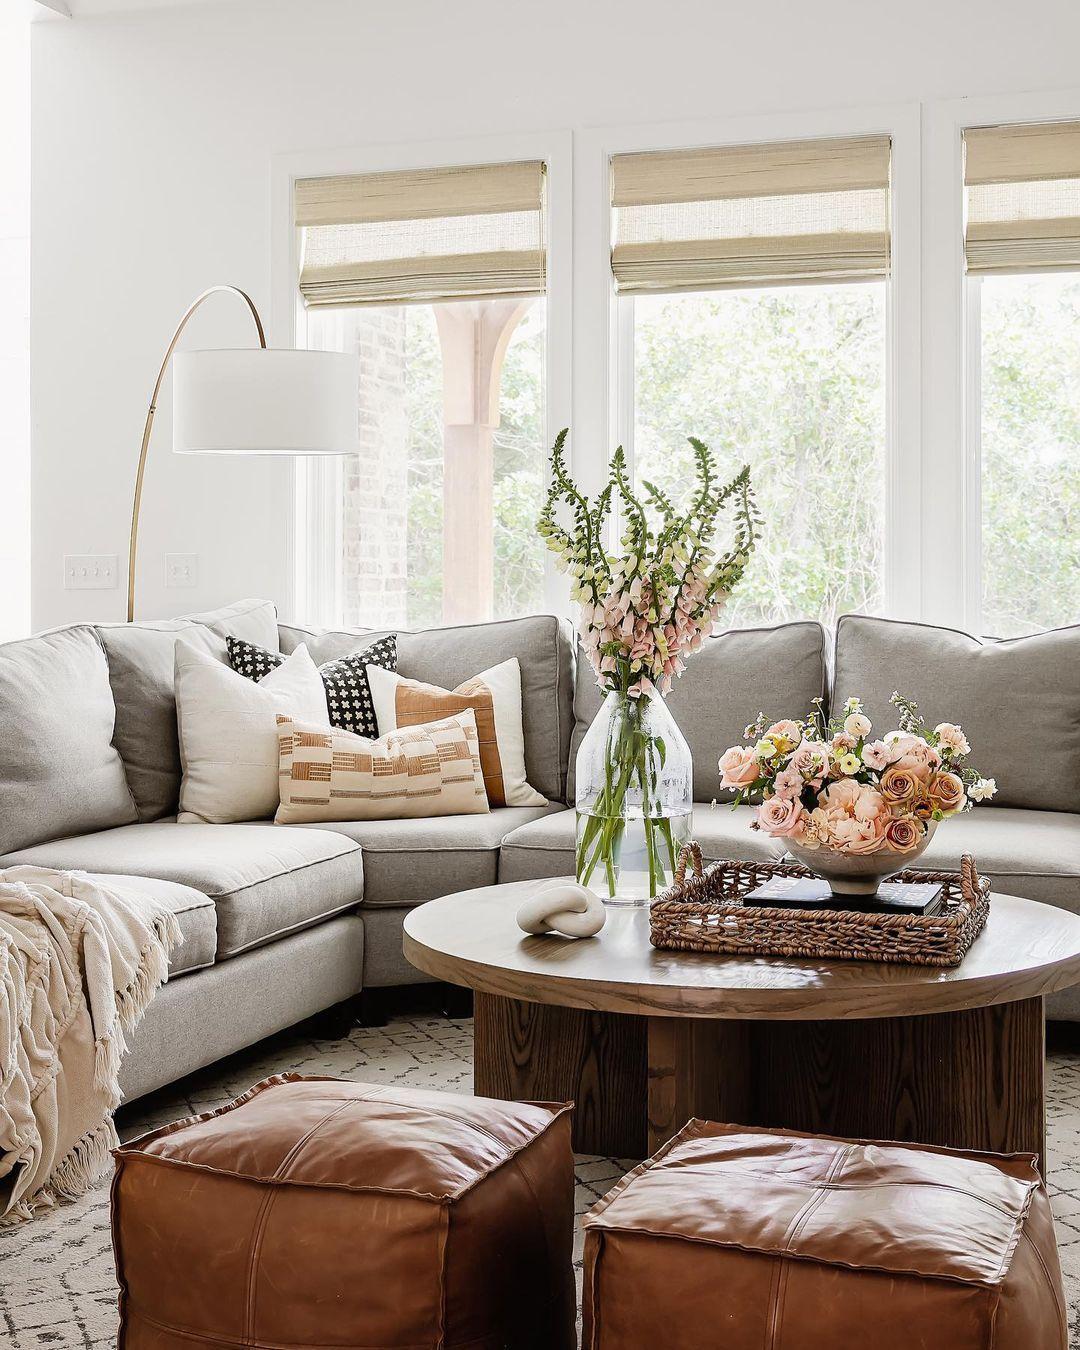 Kelsey Okc Interior Designer Kelseyleighdesignco Posted On Instagram Dec 14 2020 At 3 01am Utc Interior Design Living Room Inspiration Home Decor